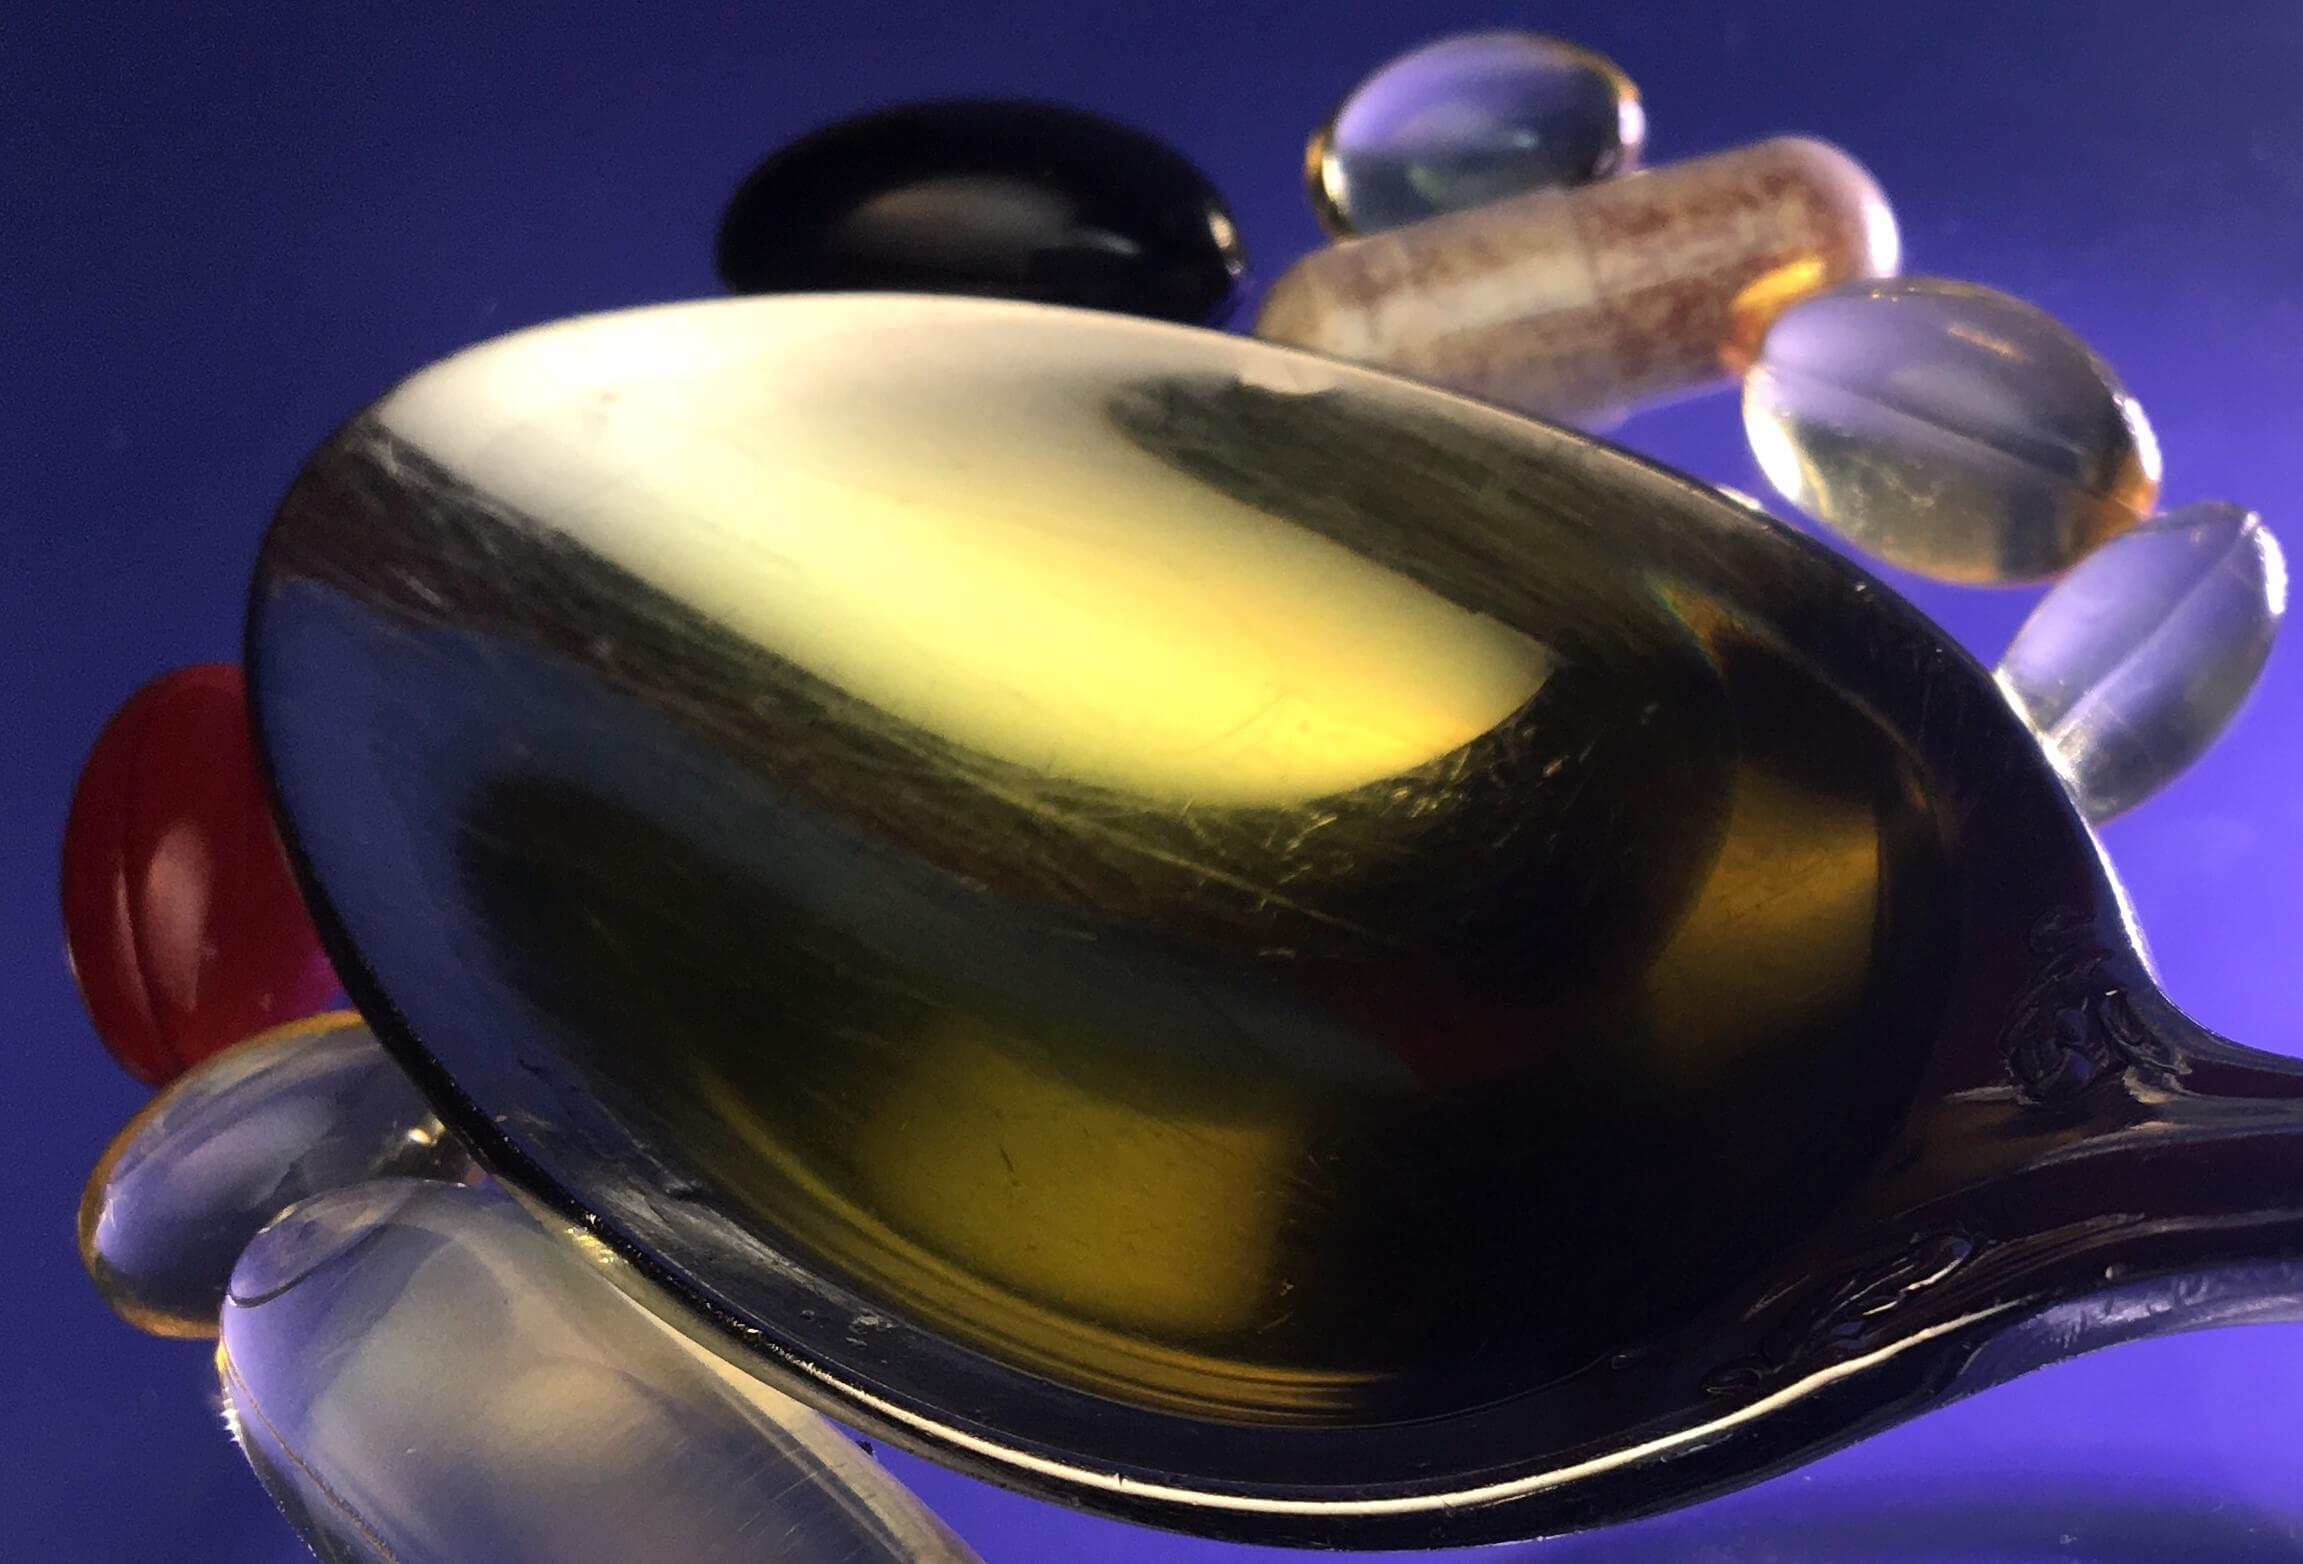 Reseñas de suplementos de vitamina A: incluye aceite de hígado de bacalao 1